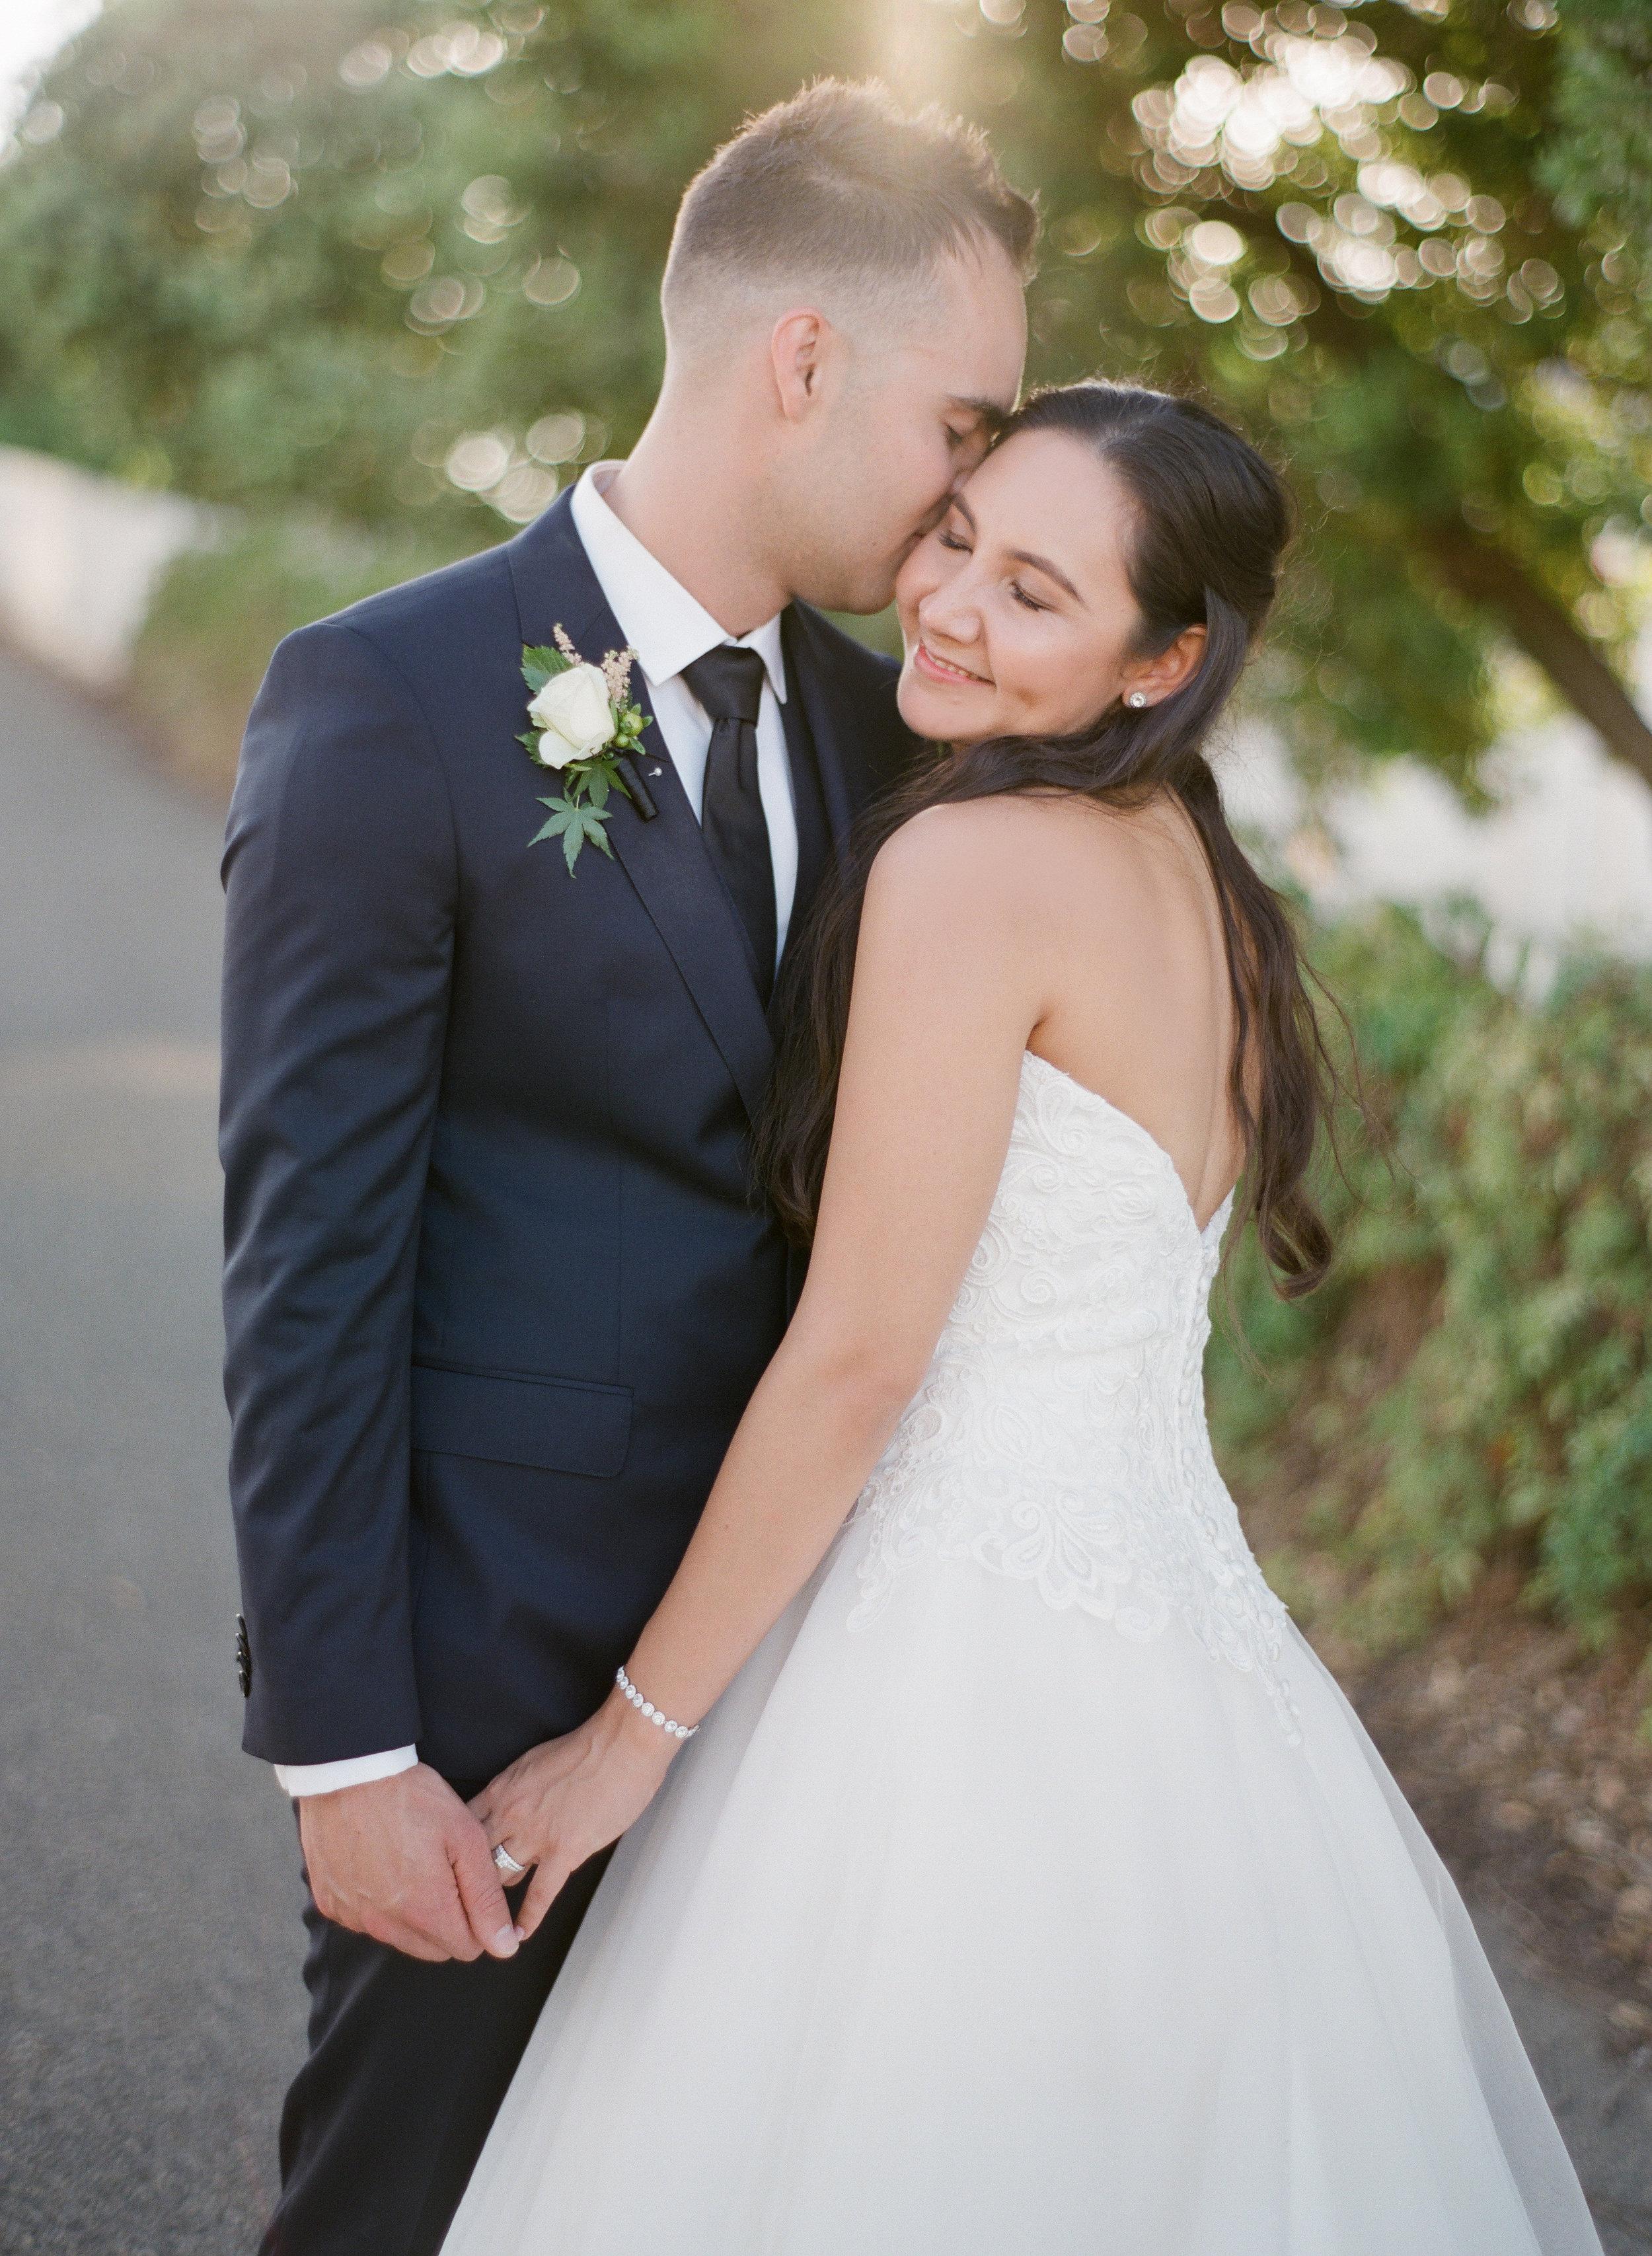 YK_wedding17_0679.jpg